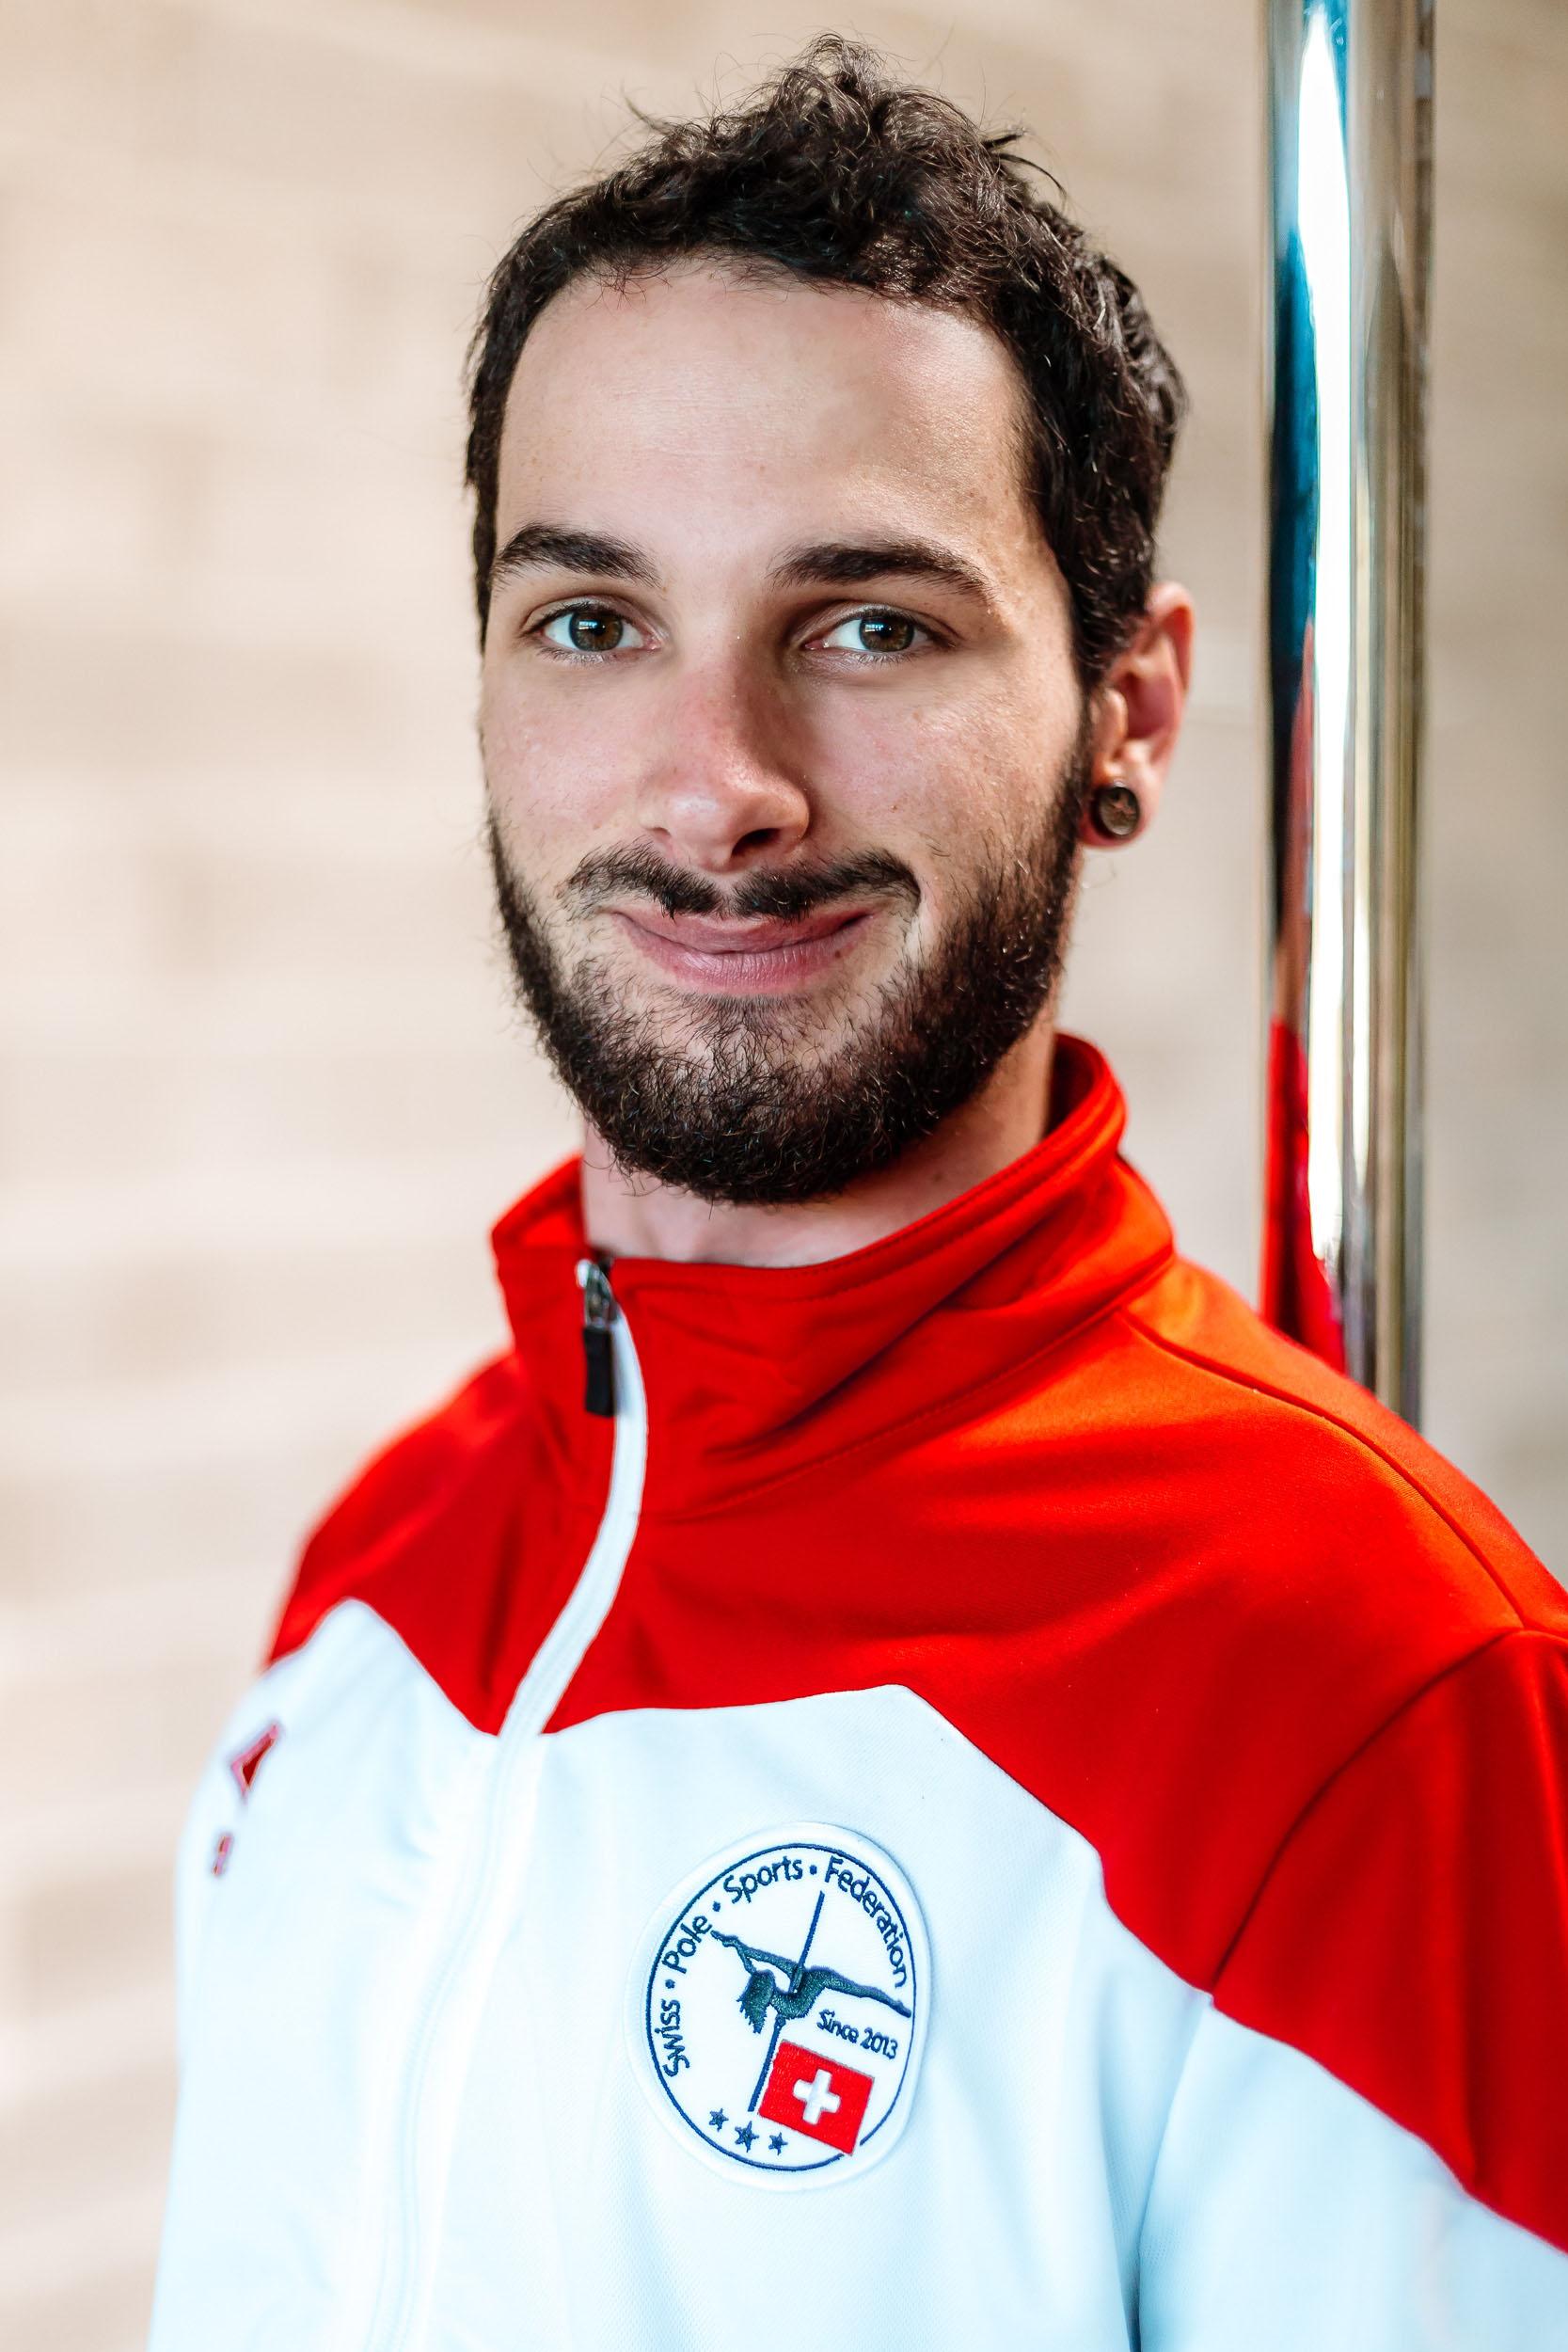 Luca Bardino